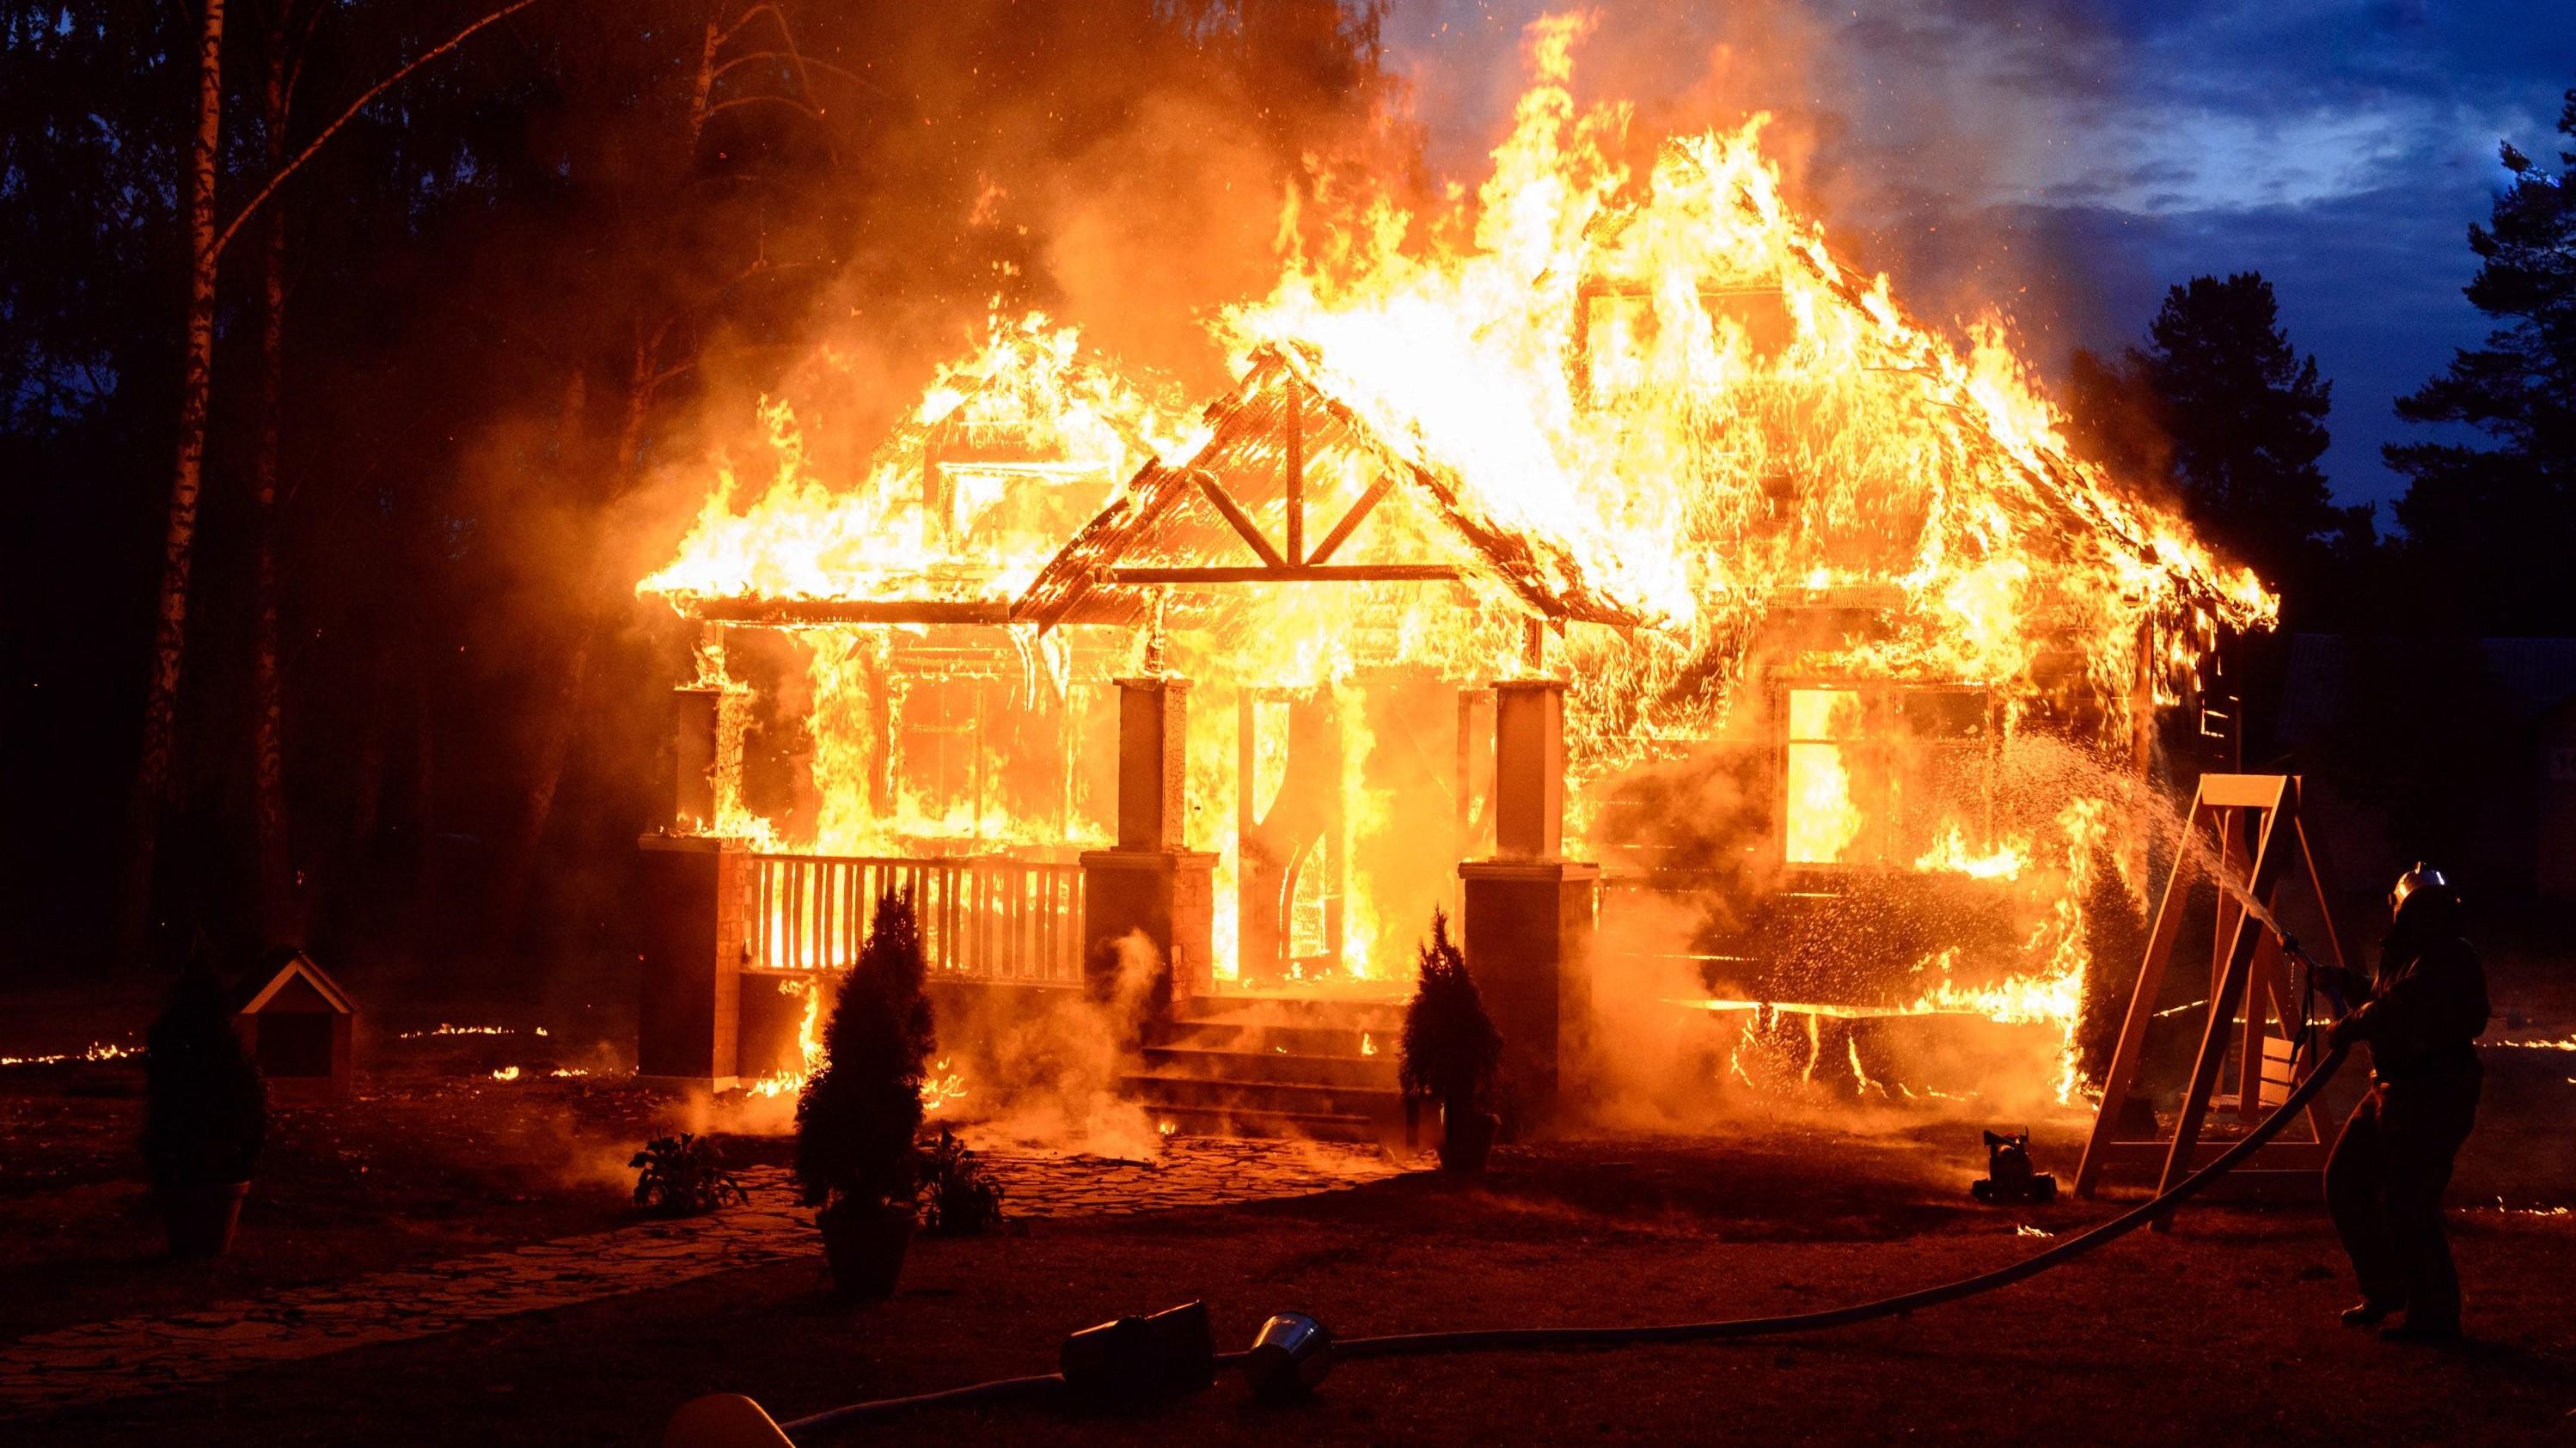 APEG Property & Casualty Insurance